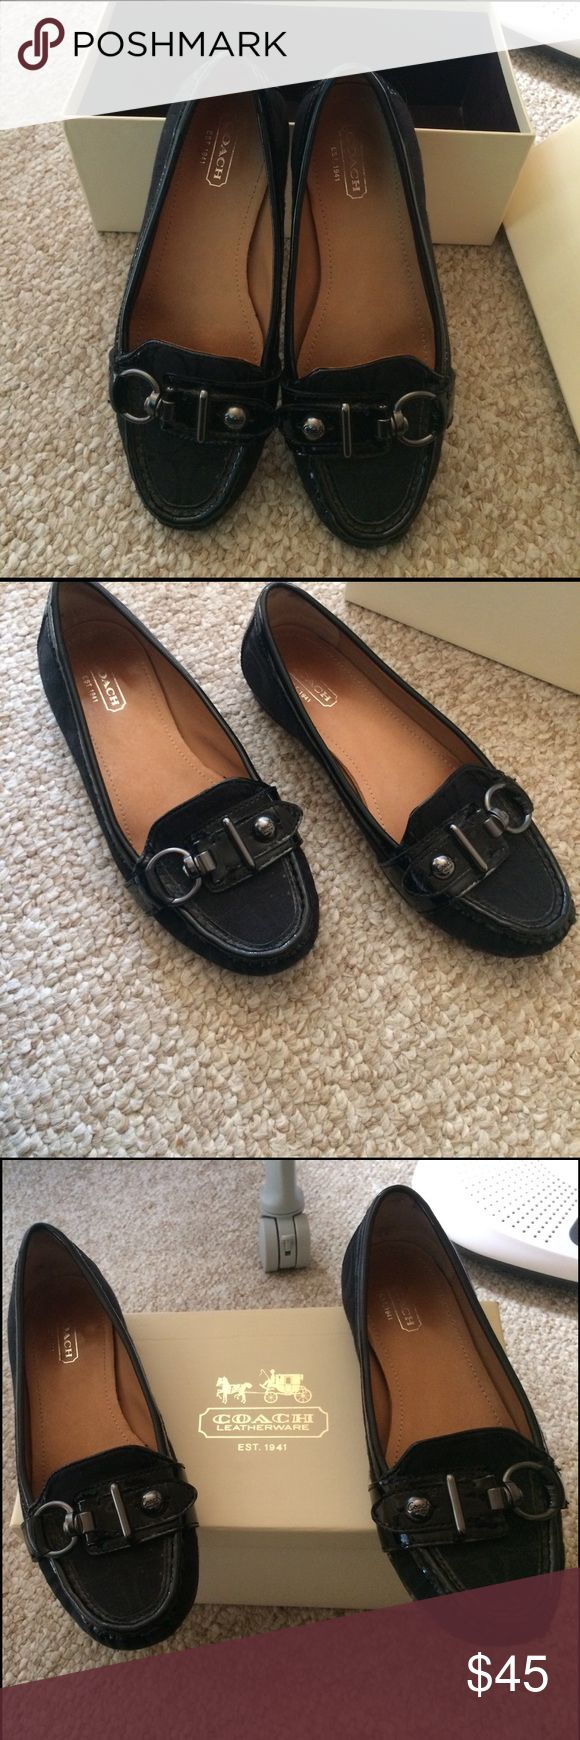 Coach flats Coach flat shoes size 6 Coach Shoes Flats & Loafers